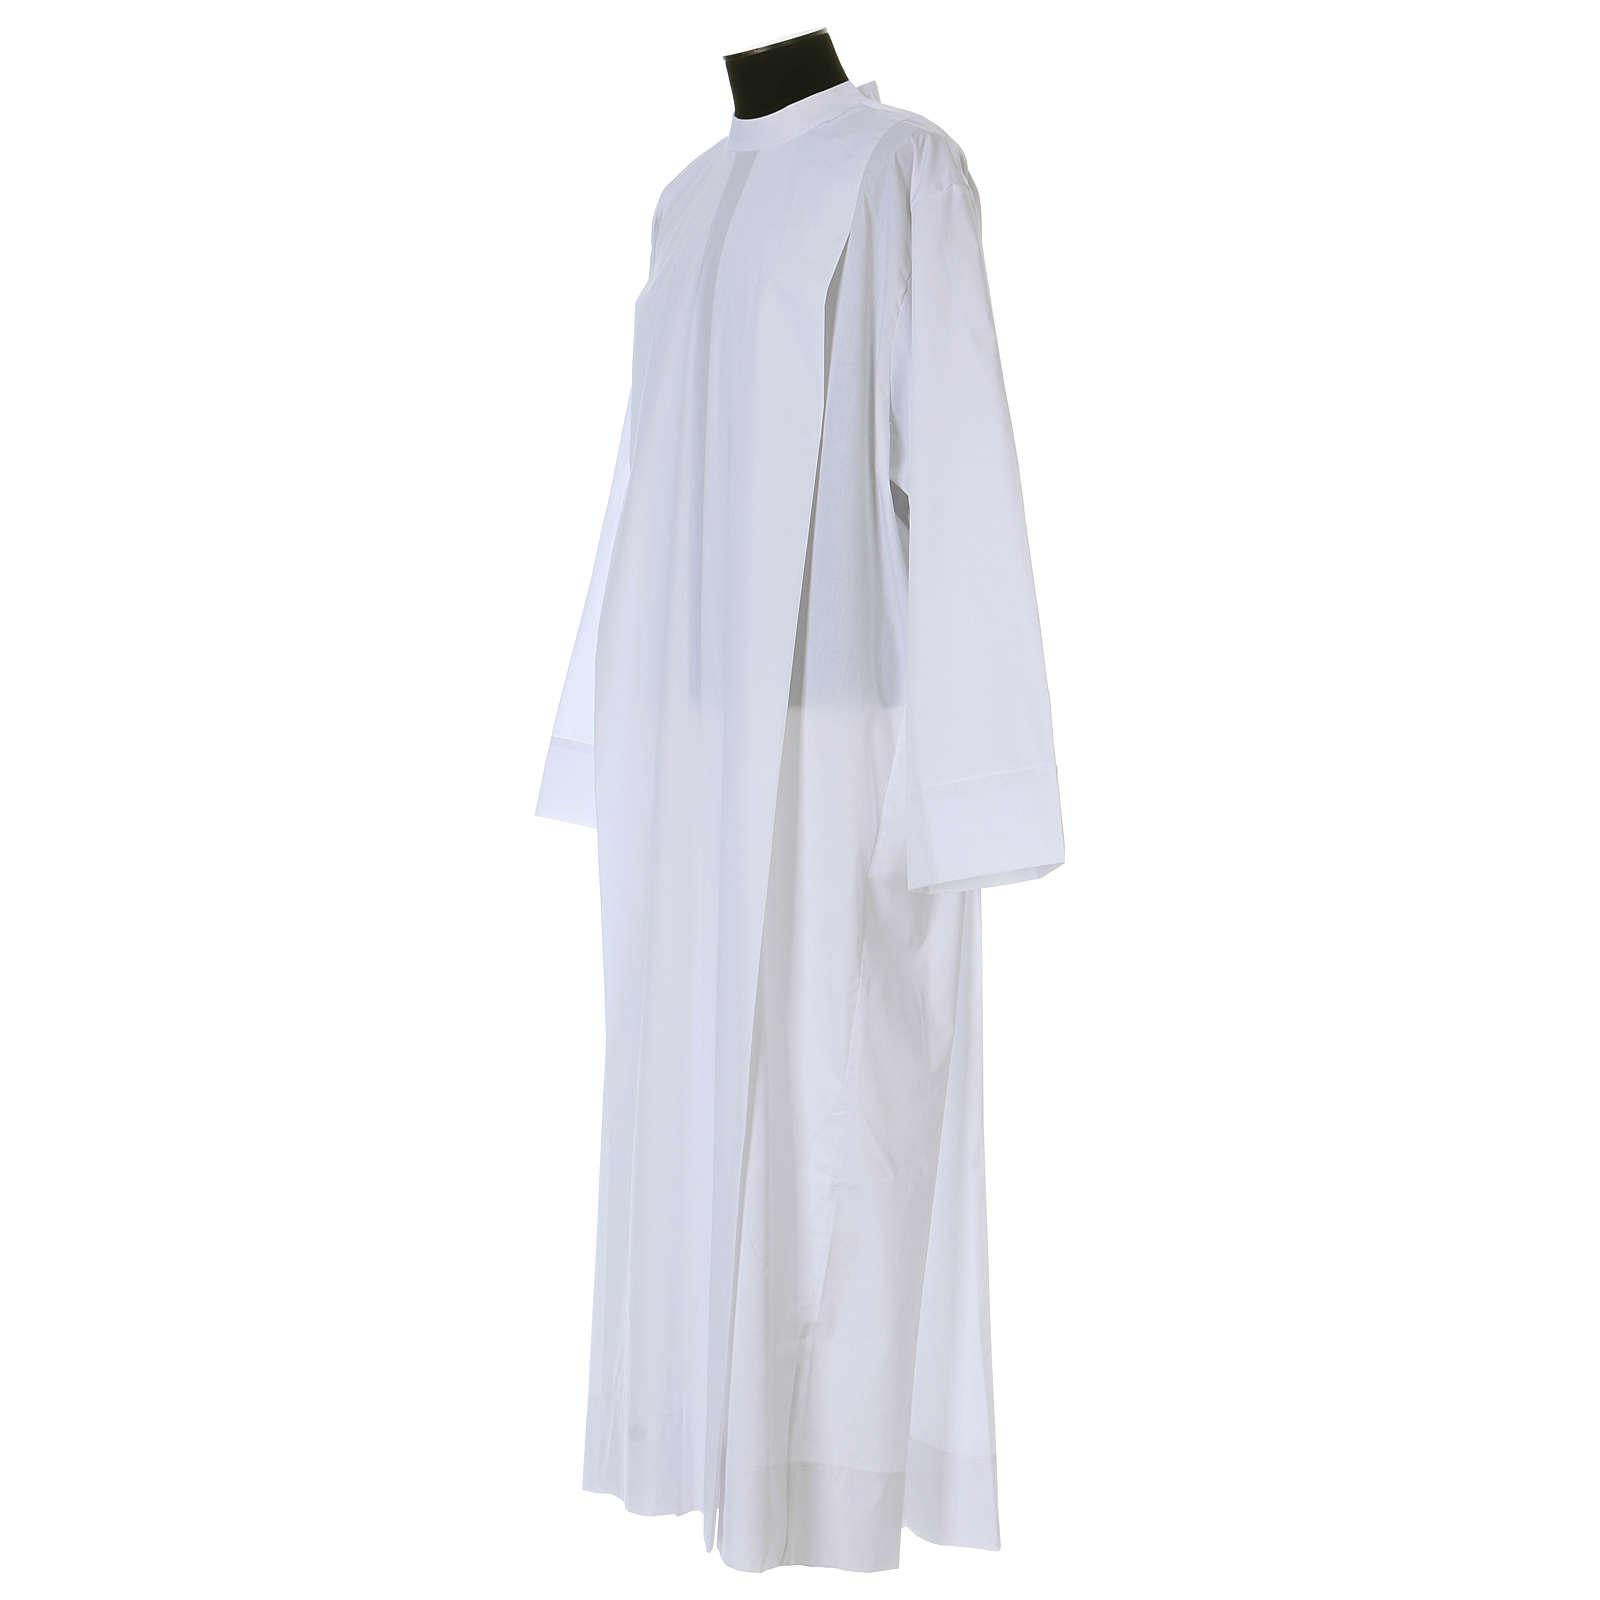 Alba blanca 65% poliéster 35% algodón dos pliegues cremallera hombro 4